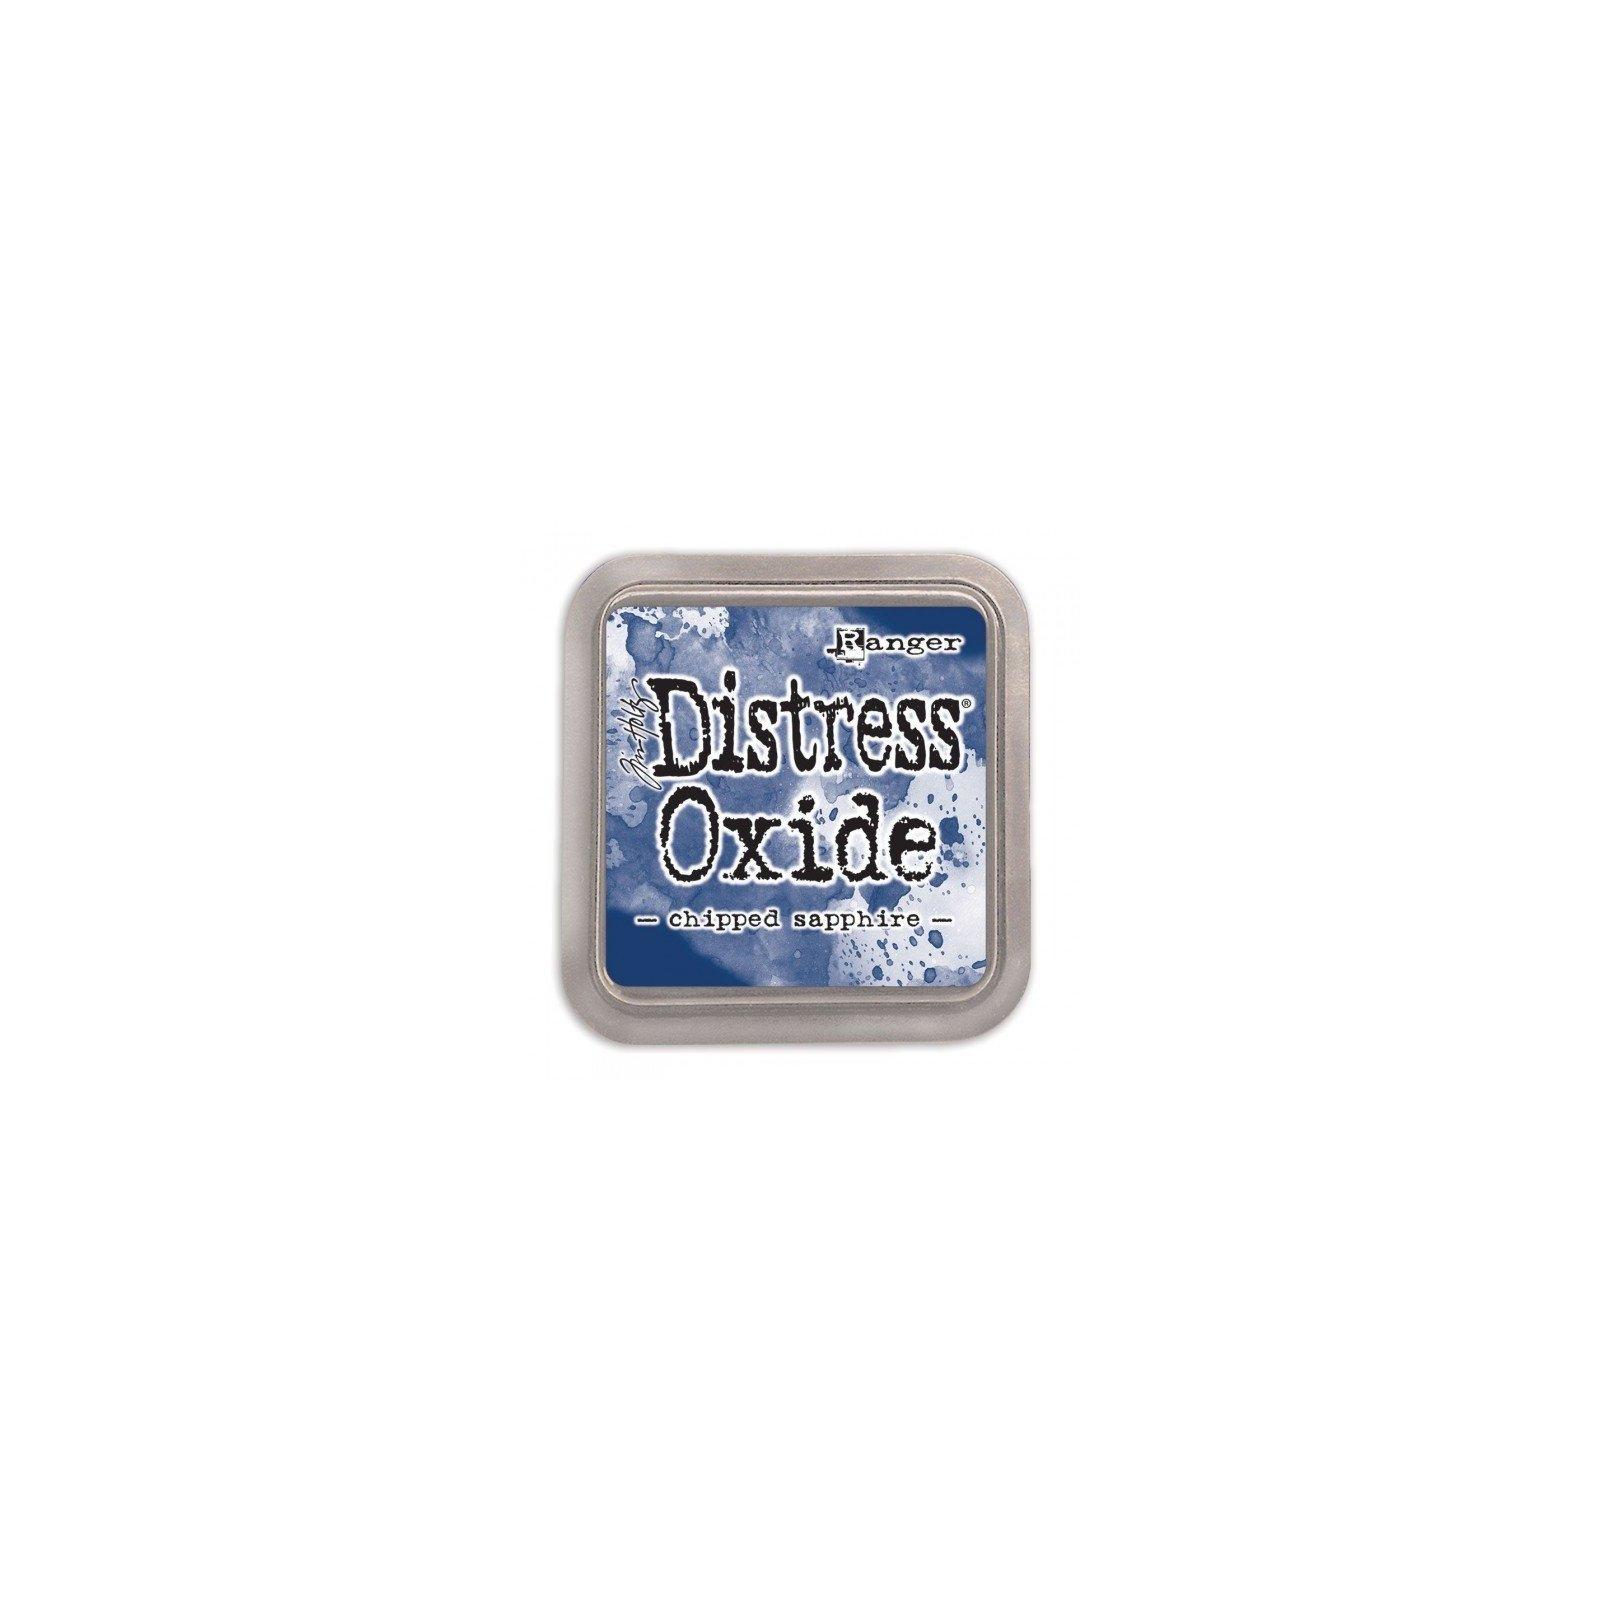 Grand encreur bleu Distress Oxide - Chipped Sapphire - Ranger